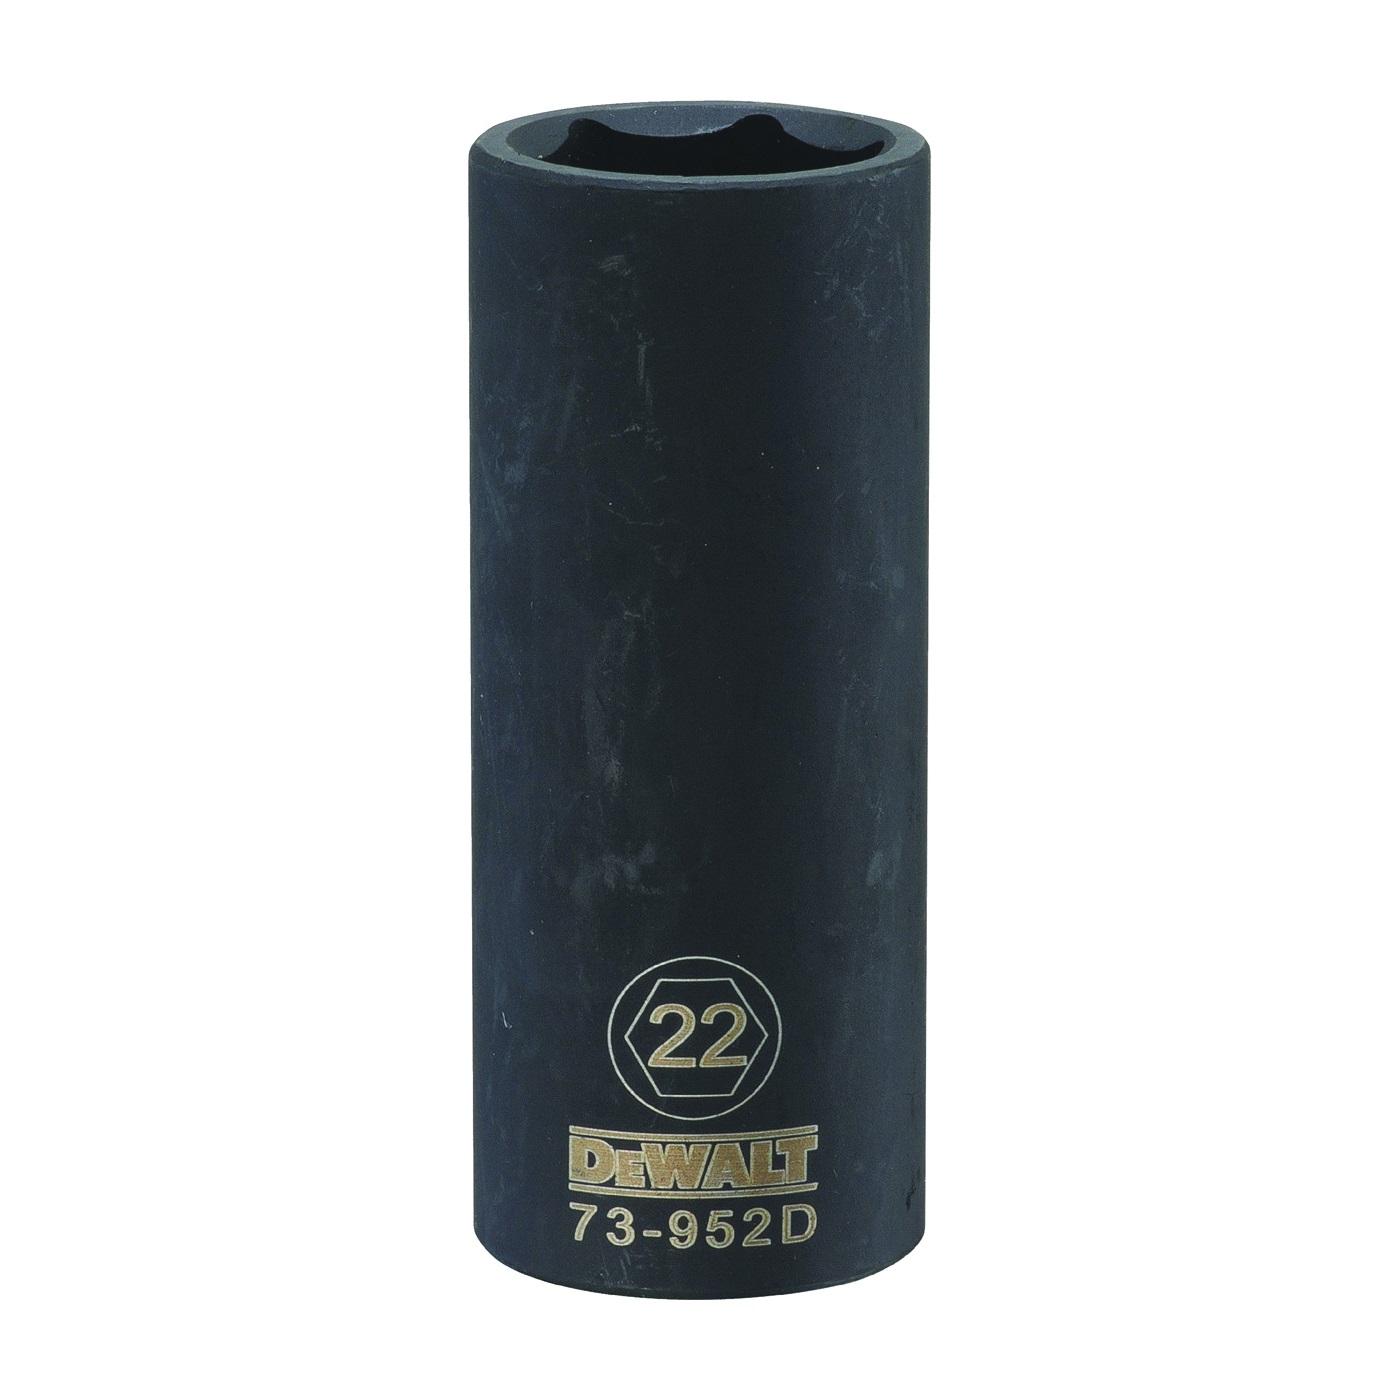 Picture of DeWALT DWMT73952OSP Impact Socket, 22 mm Socket, 1/2 in Drive, 6 -Point, CR-440 Steel, Black Oxide